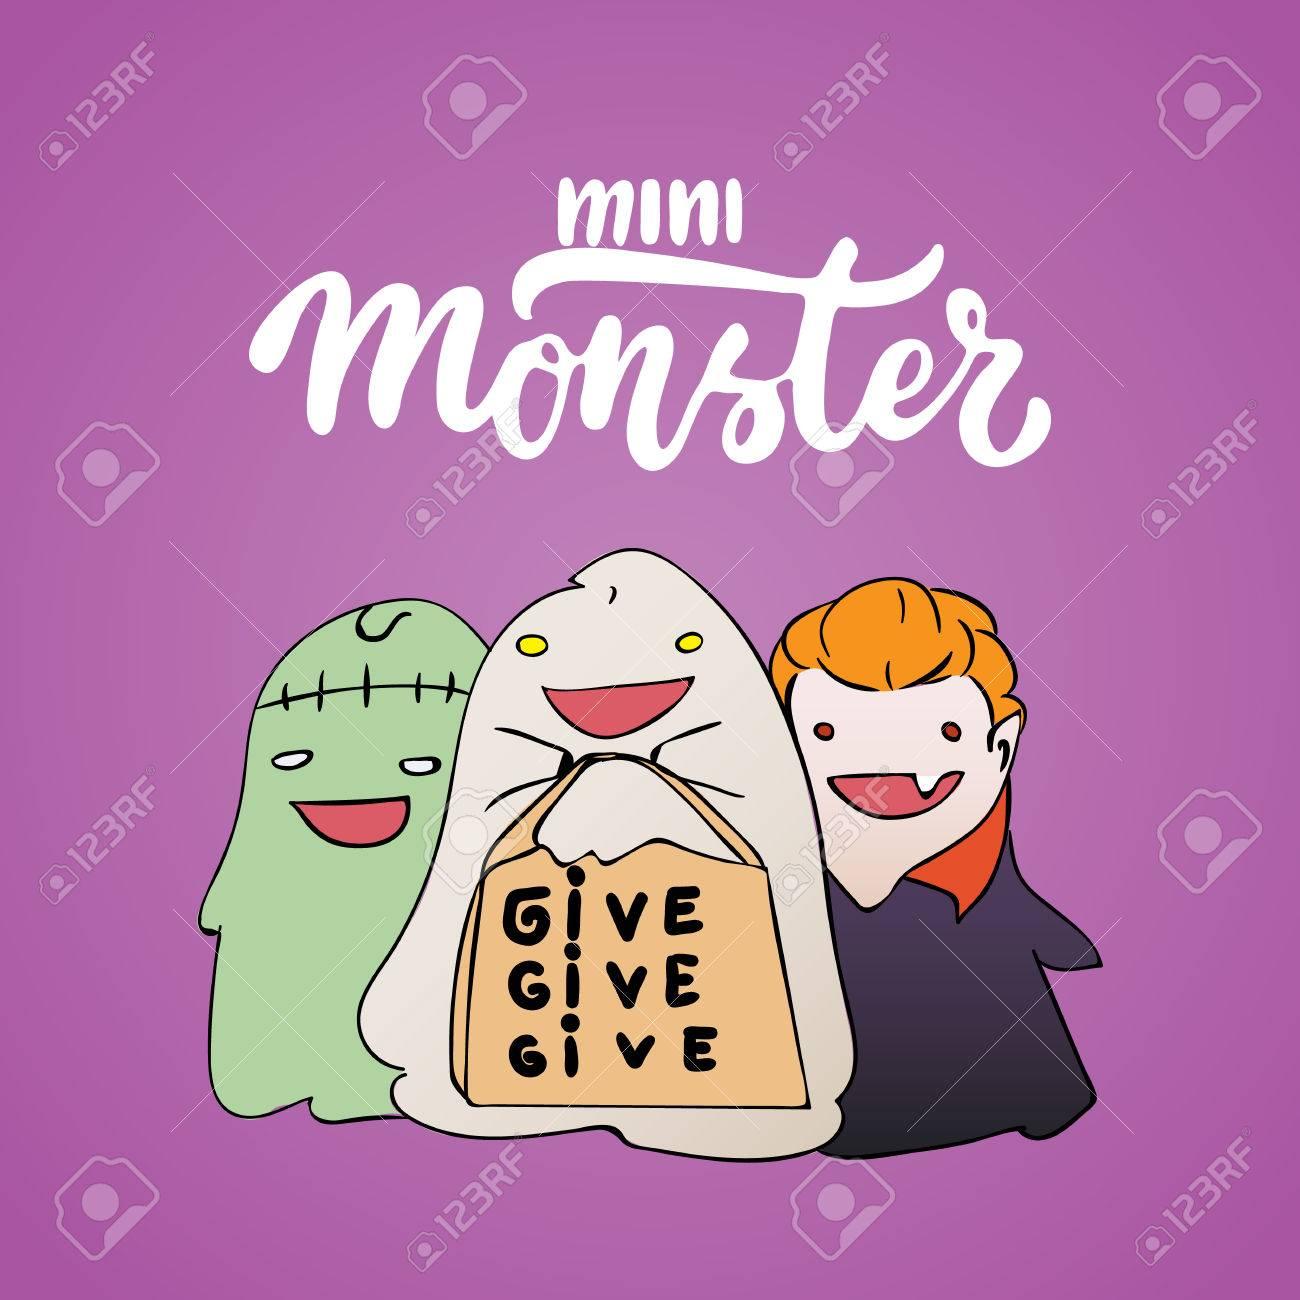 Mini Monstruo - Letras Dibujado A Mano Fiesta De Halloween Y Tarjeta De  Dibujo Con Niños Vestidos Con Un Traje De Vampiro fc3580fc60eba